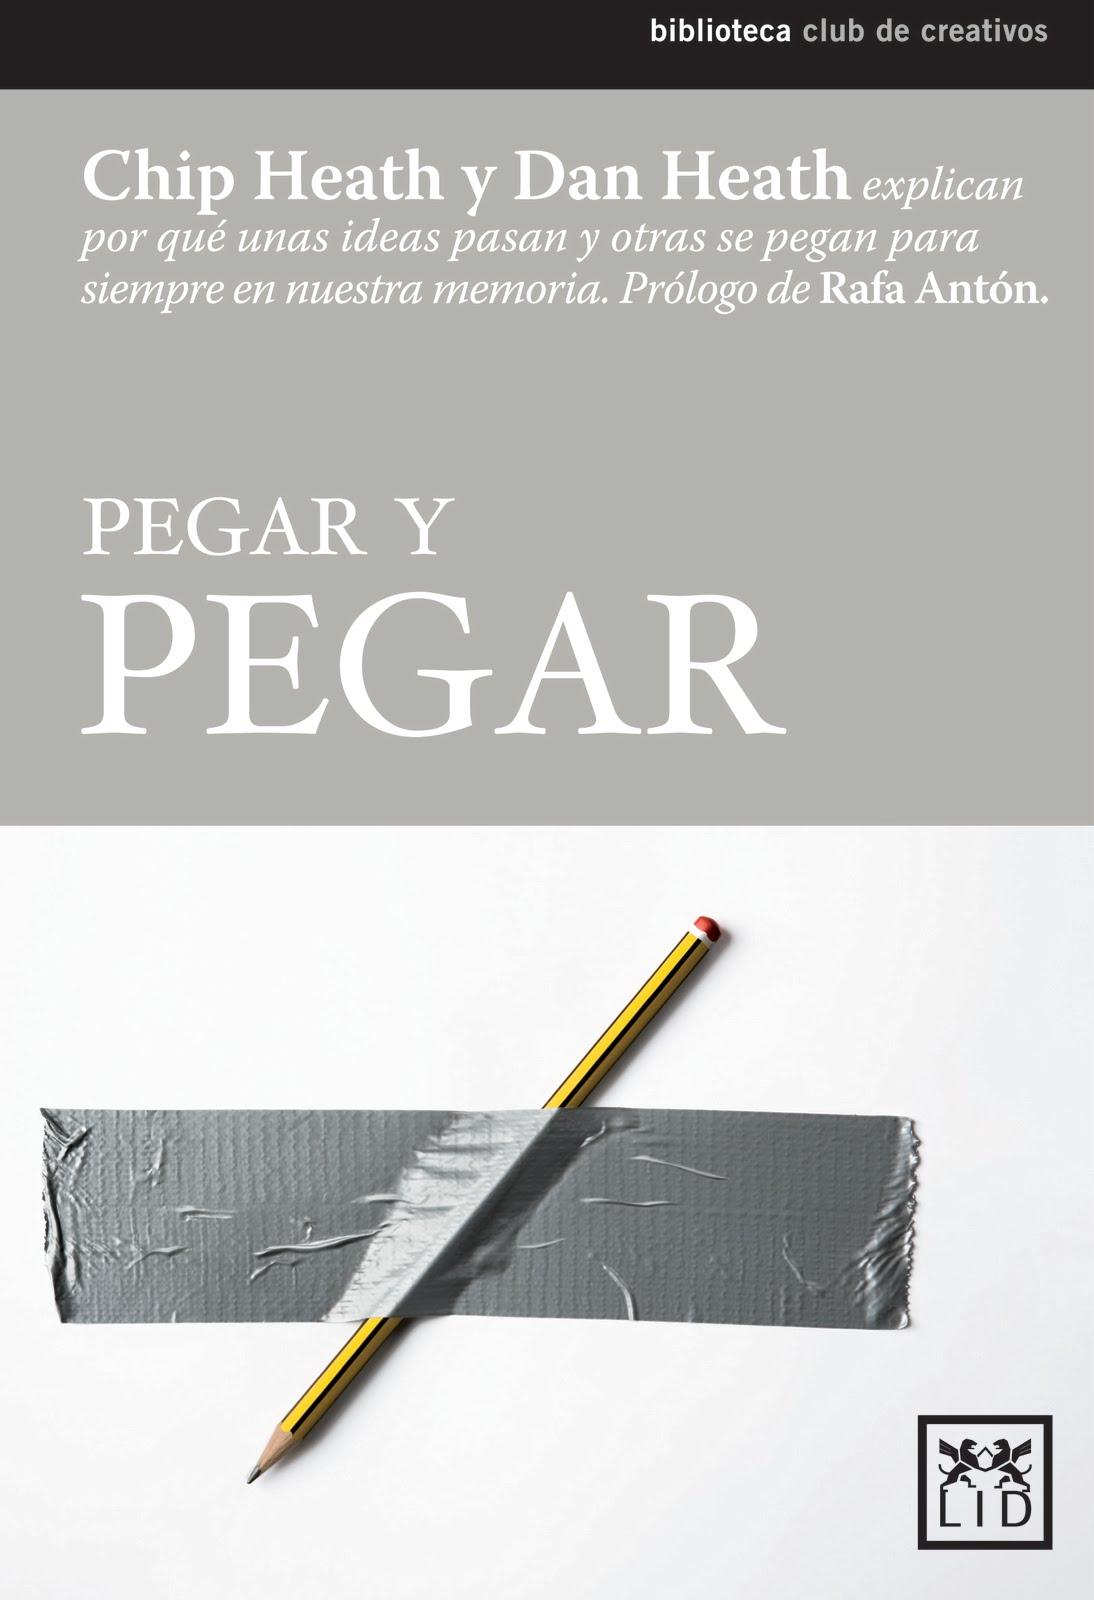 Pegar y pegar | Made to Stick